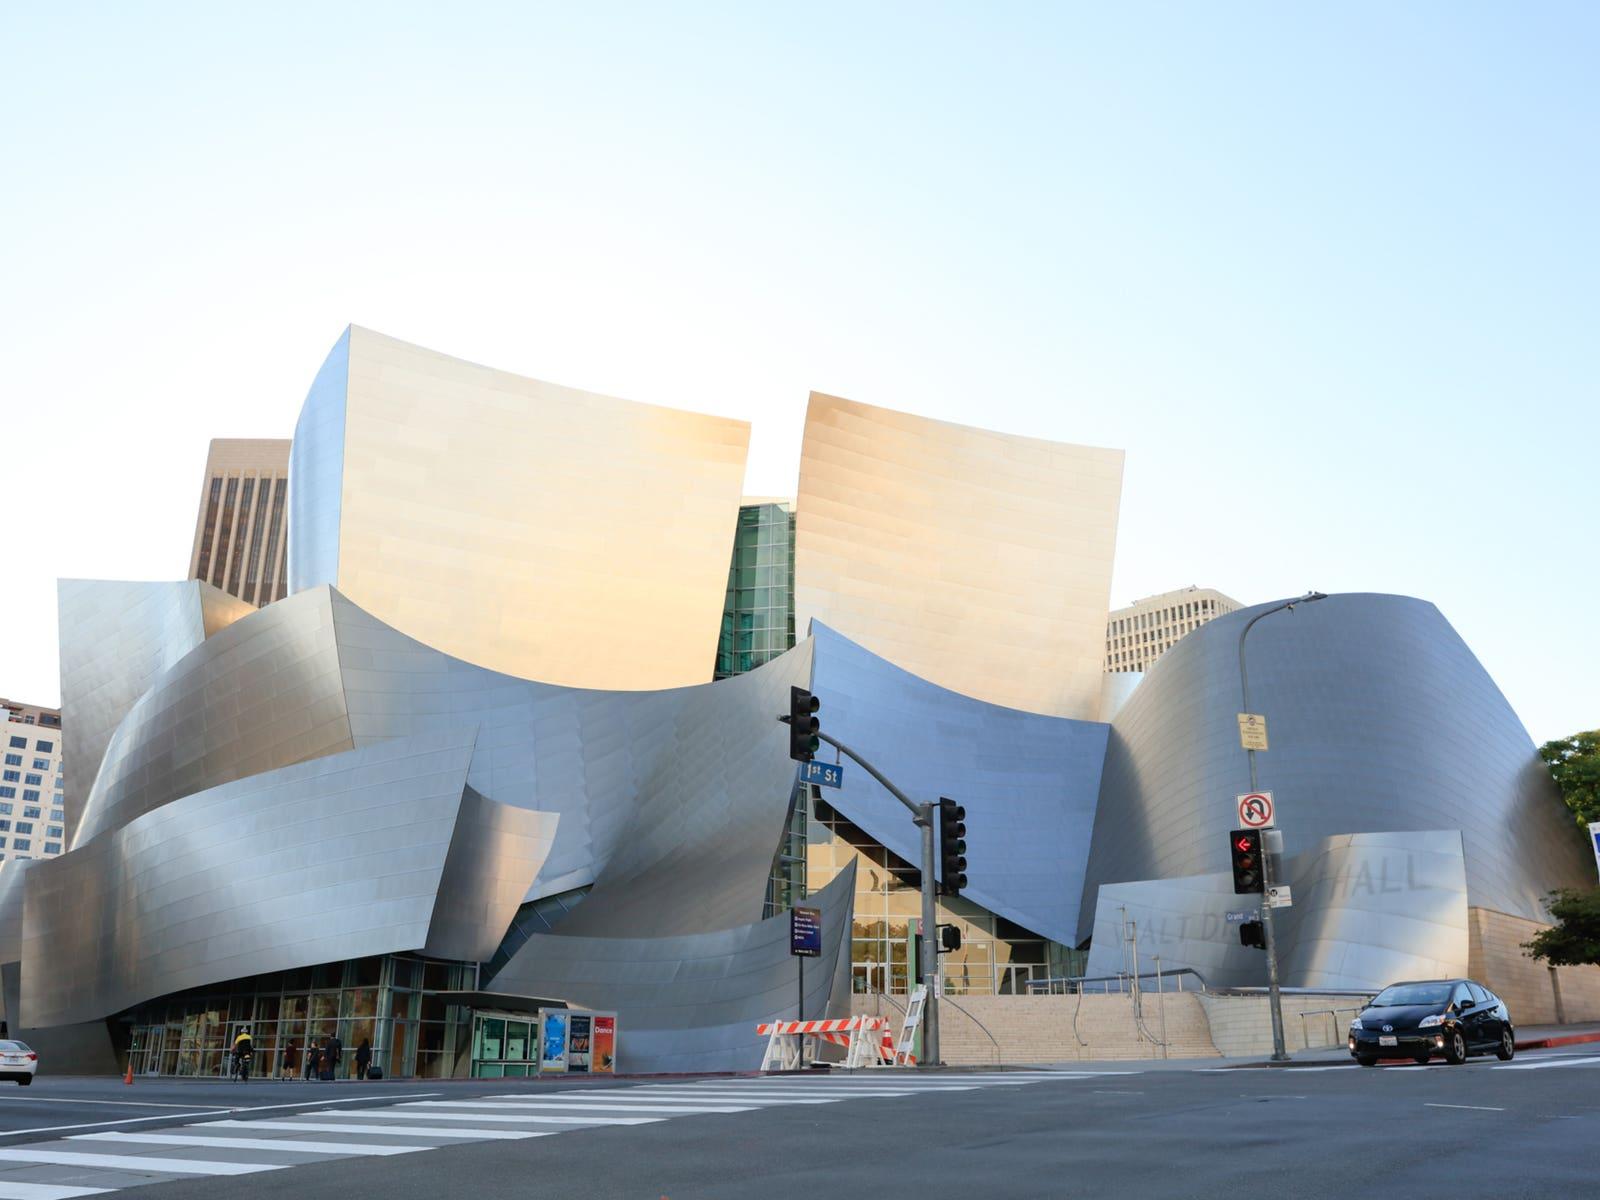 Walt Disney Concert Hall at the Music Center